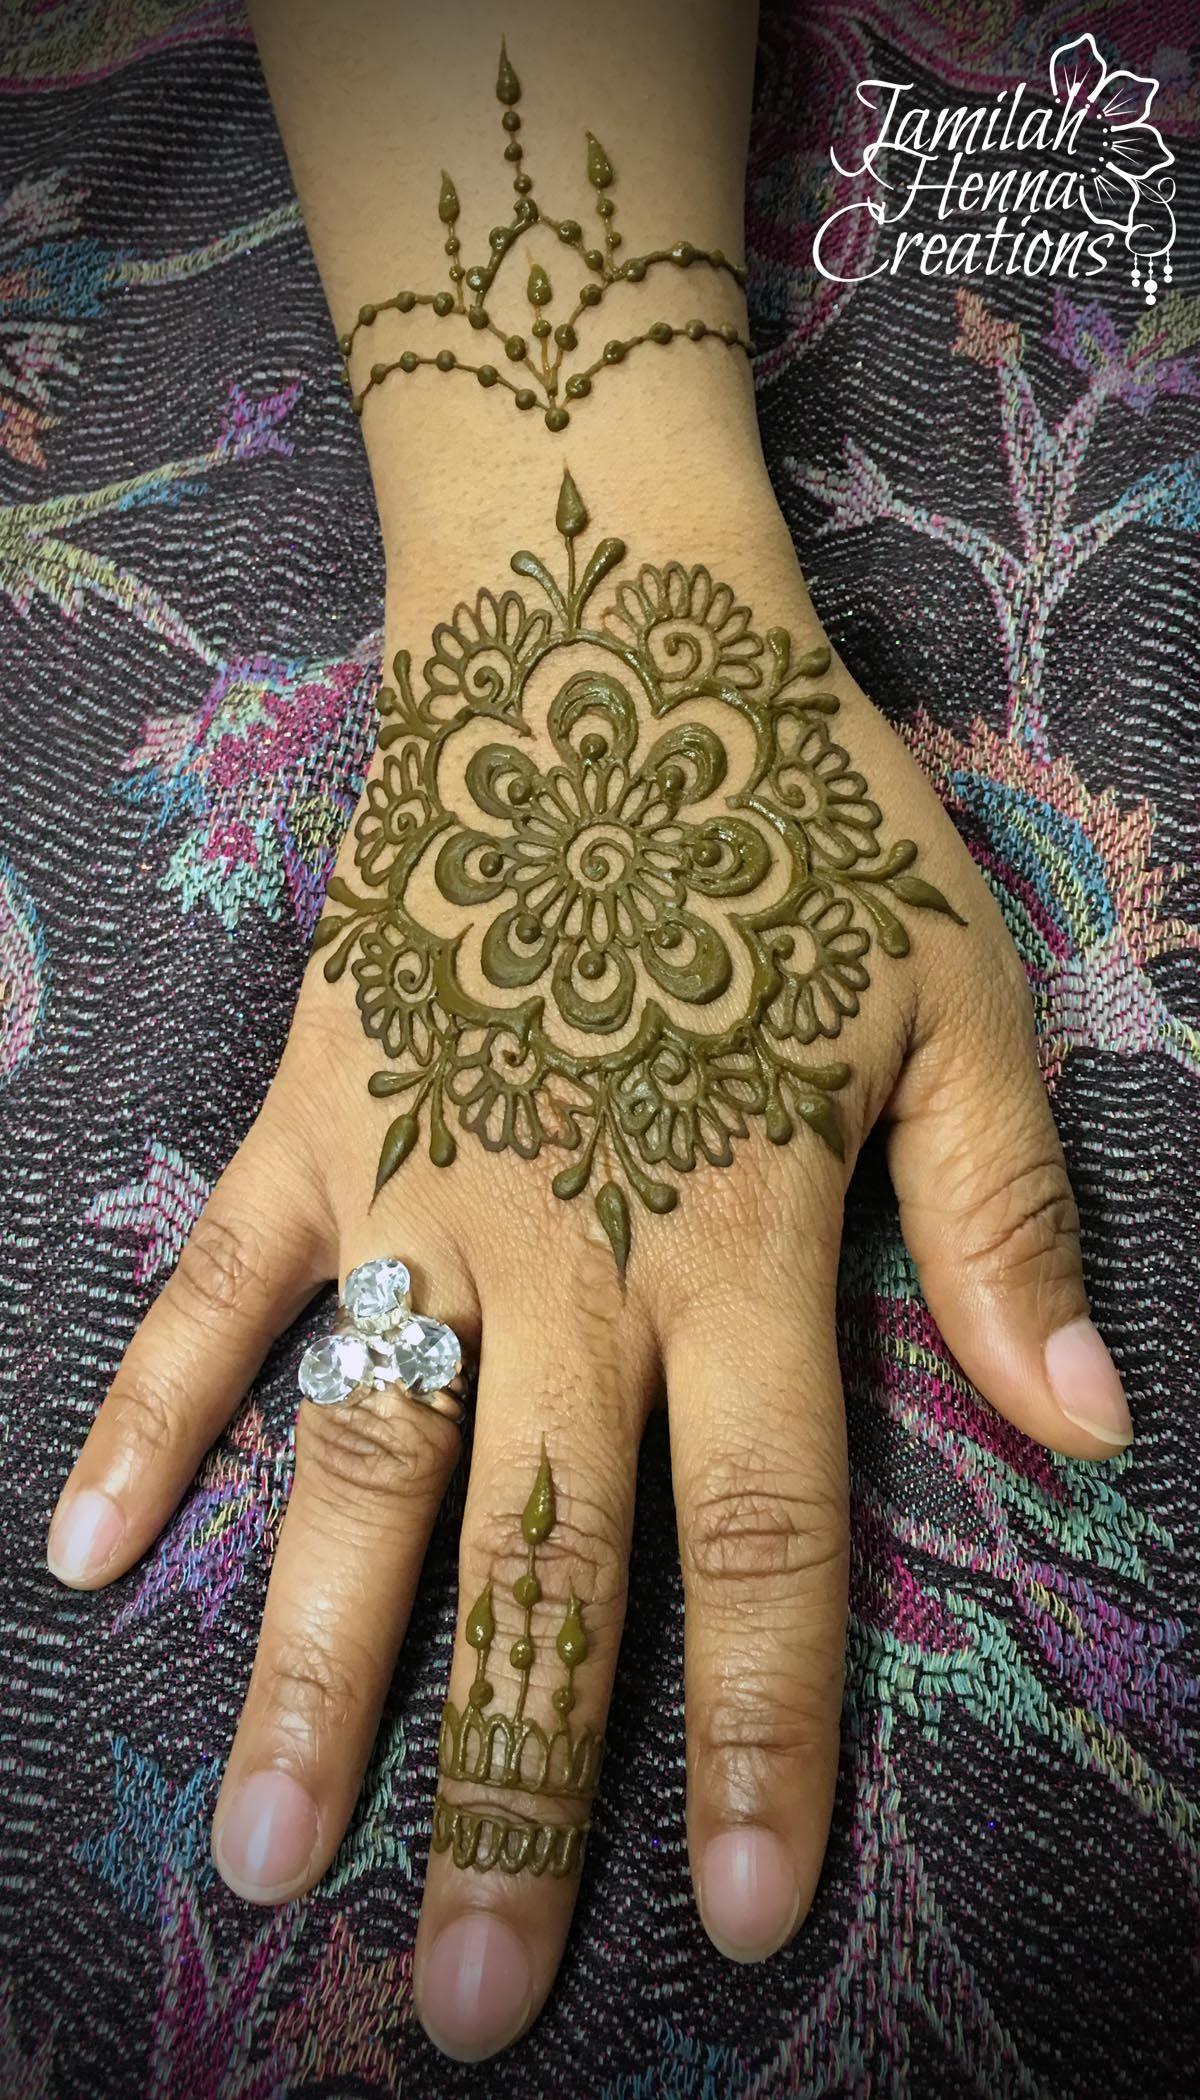 Mandala Jewelry Henna Www Jamilahhennacreations Com Henna Patterns